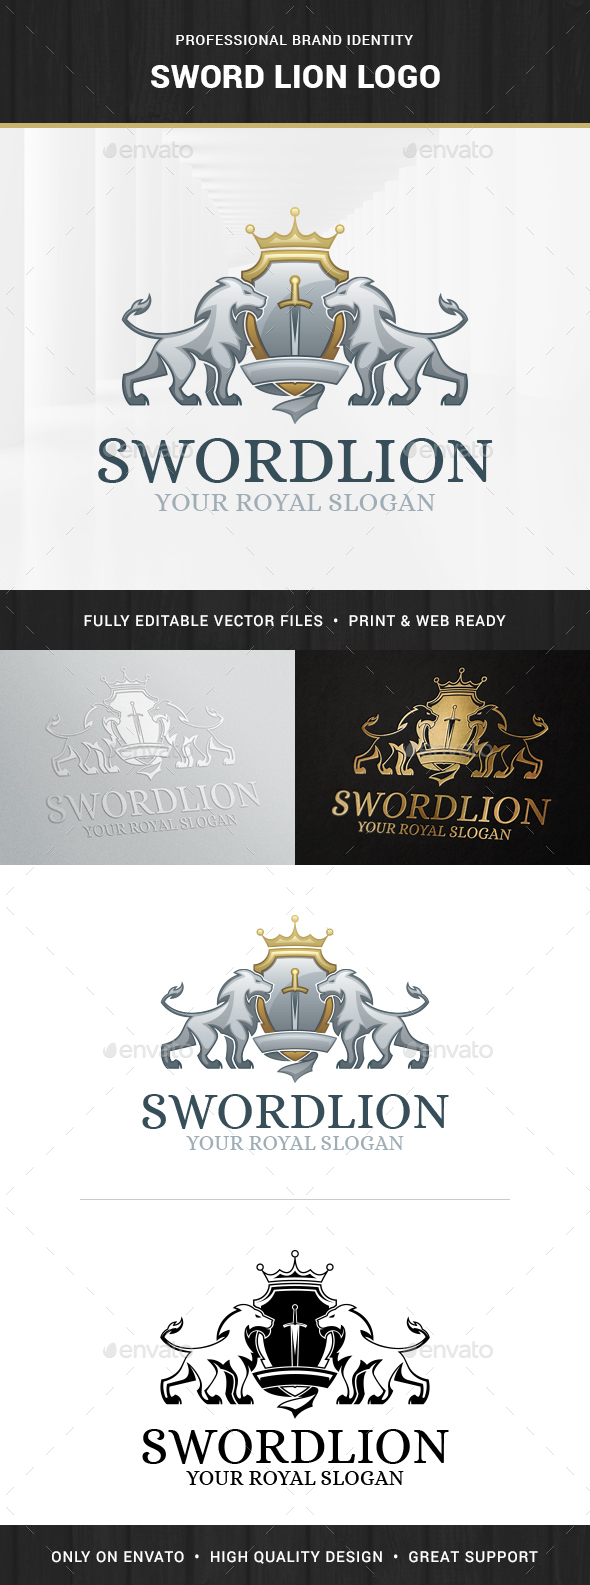 Sword Lion Logo Template